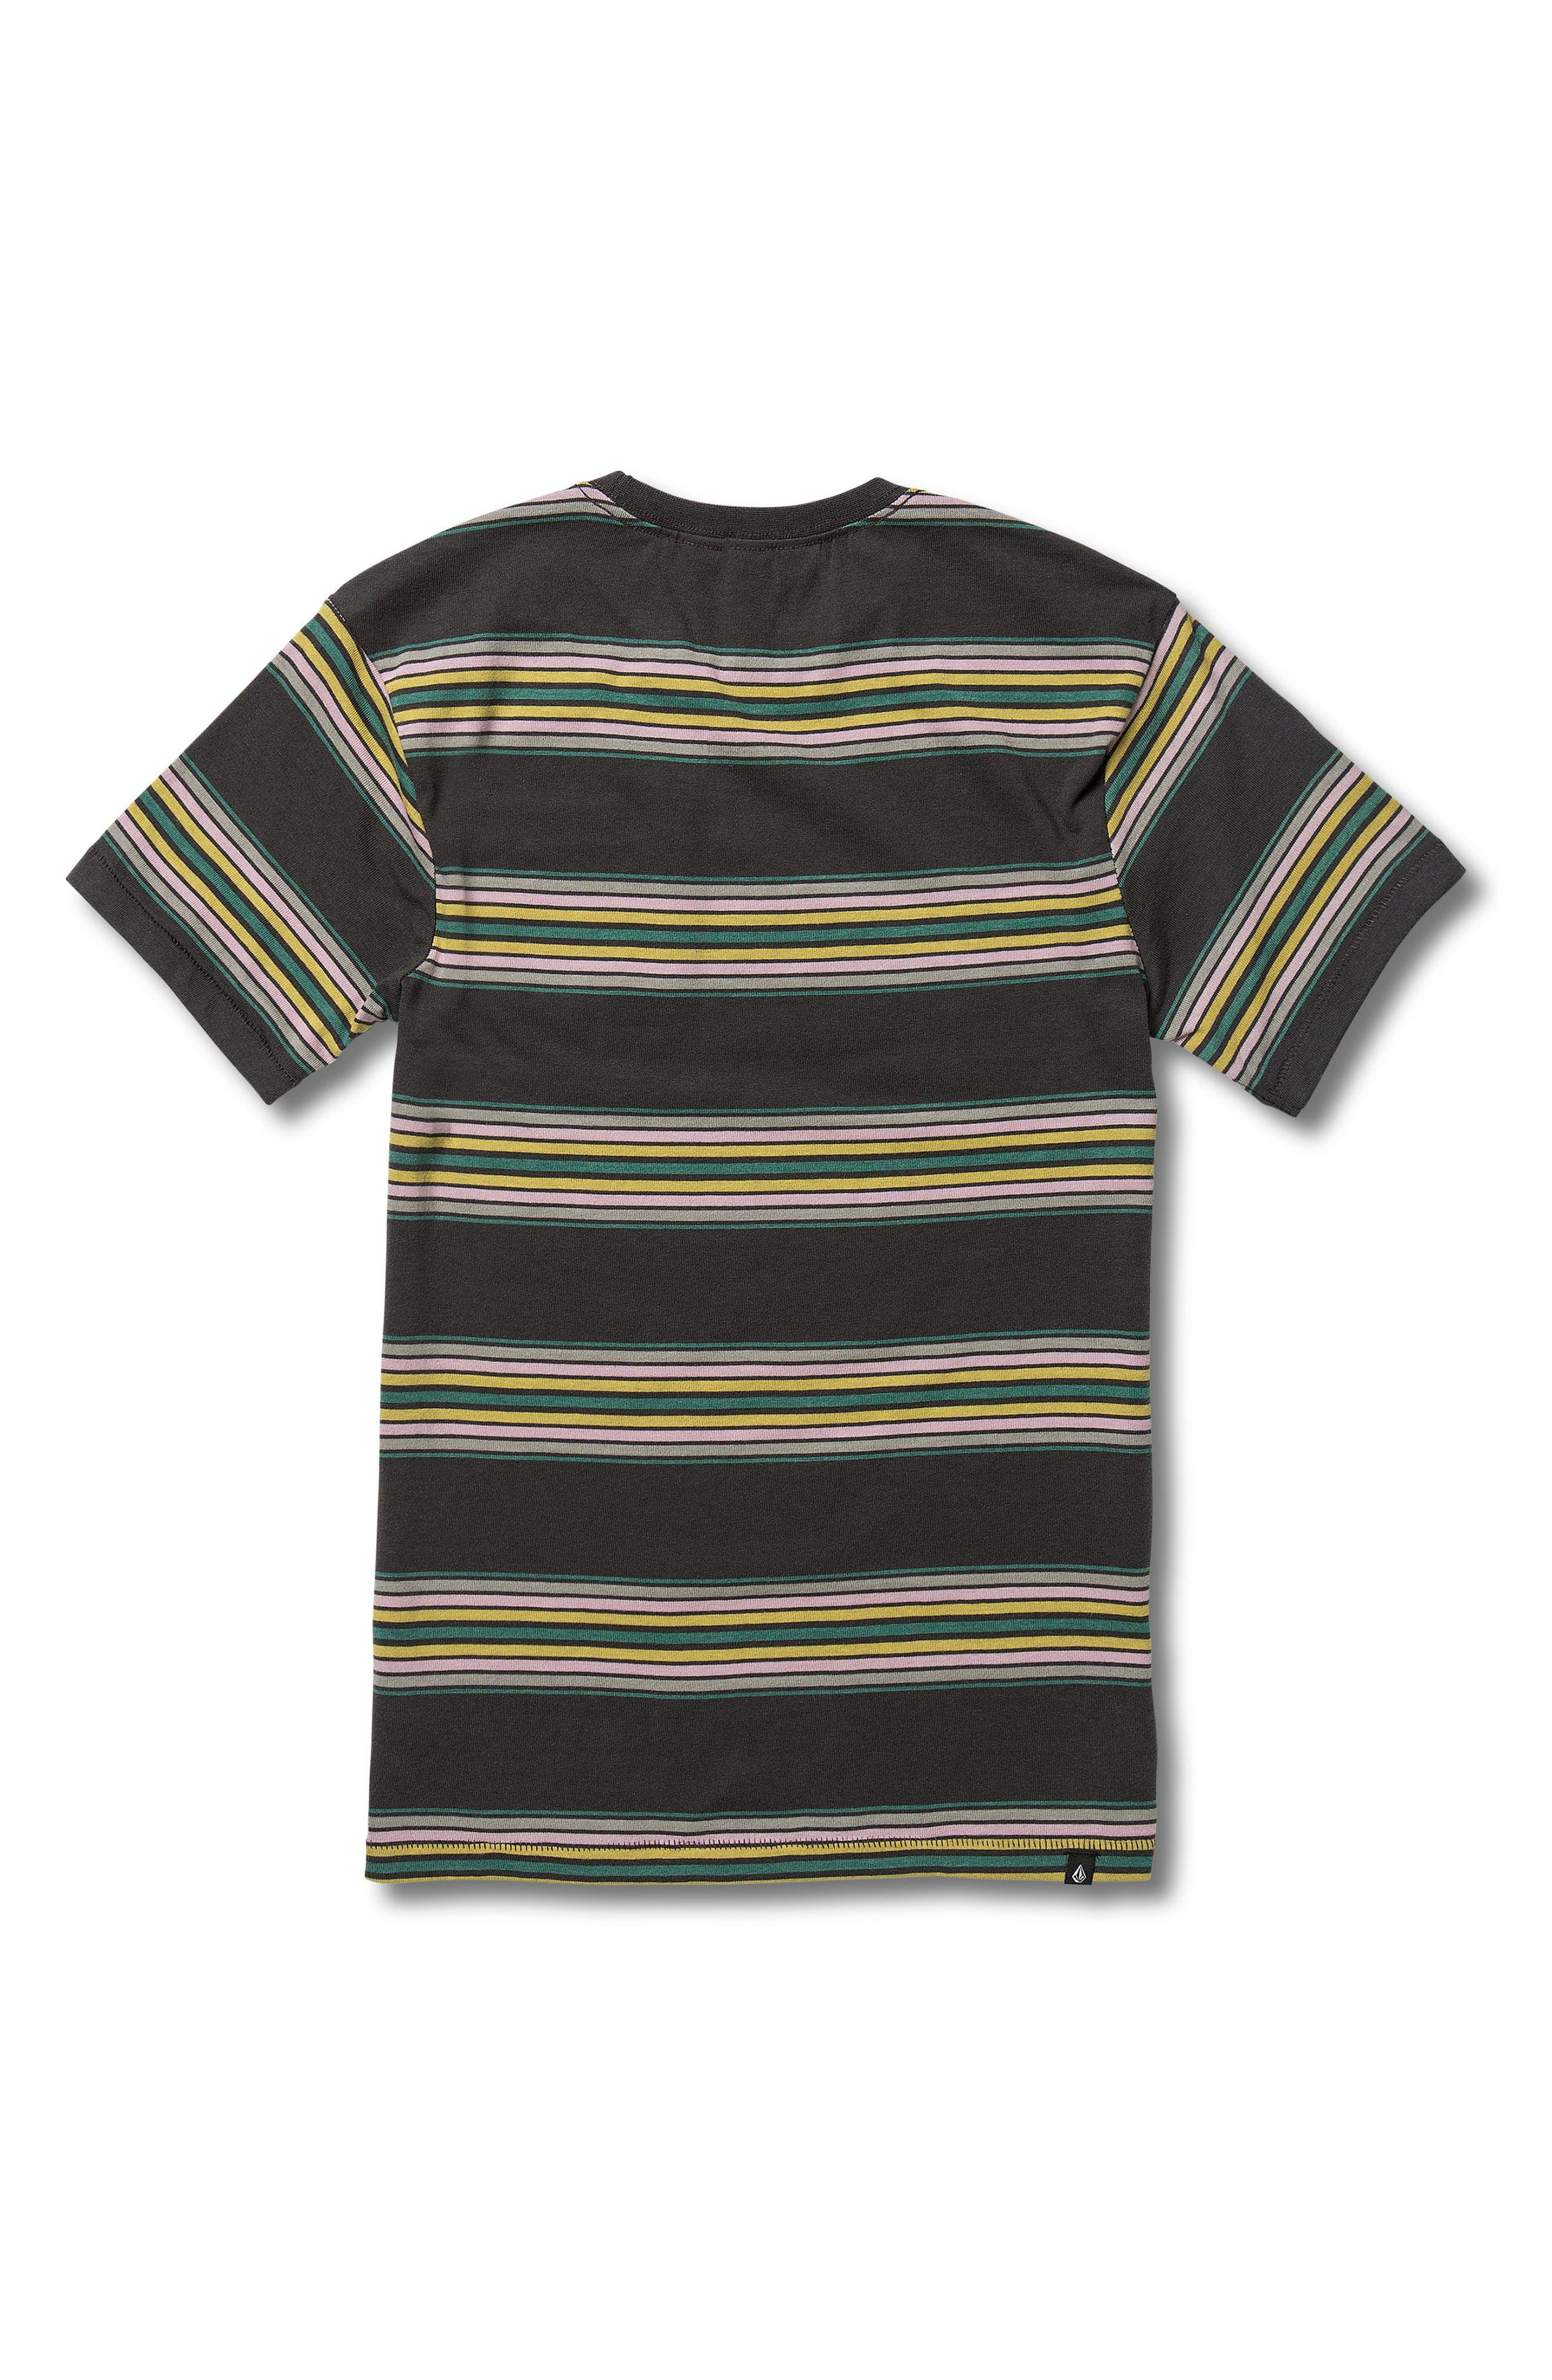 Idle T-Shirt,                             Alternate thumbnail 2, color,                             ASPHALT BL